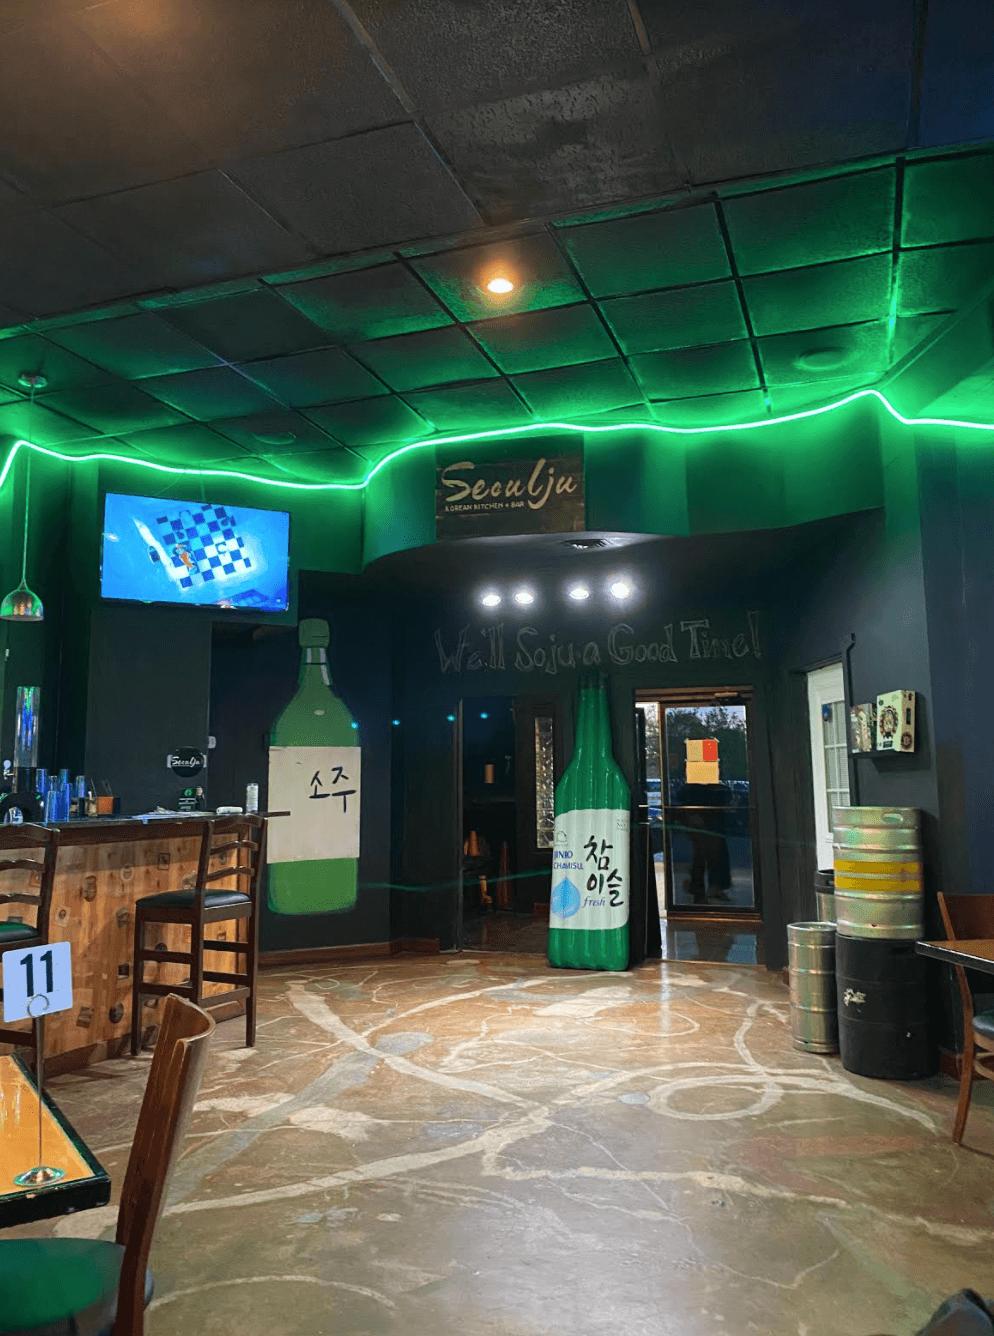 Interior of Seoulju Korean Kitchen and Bar.